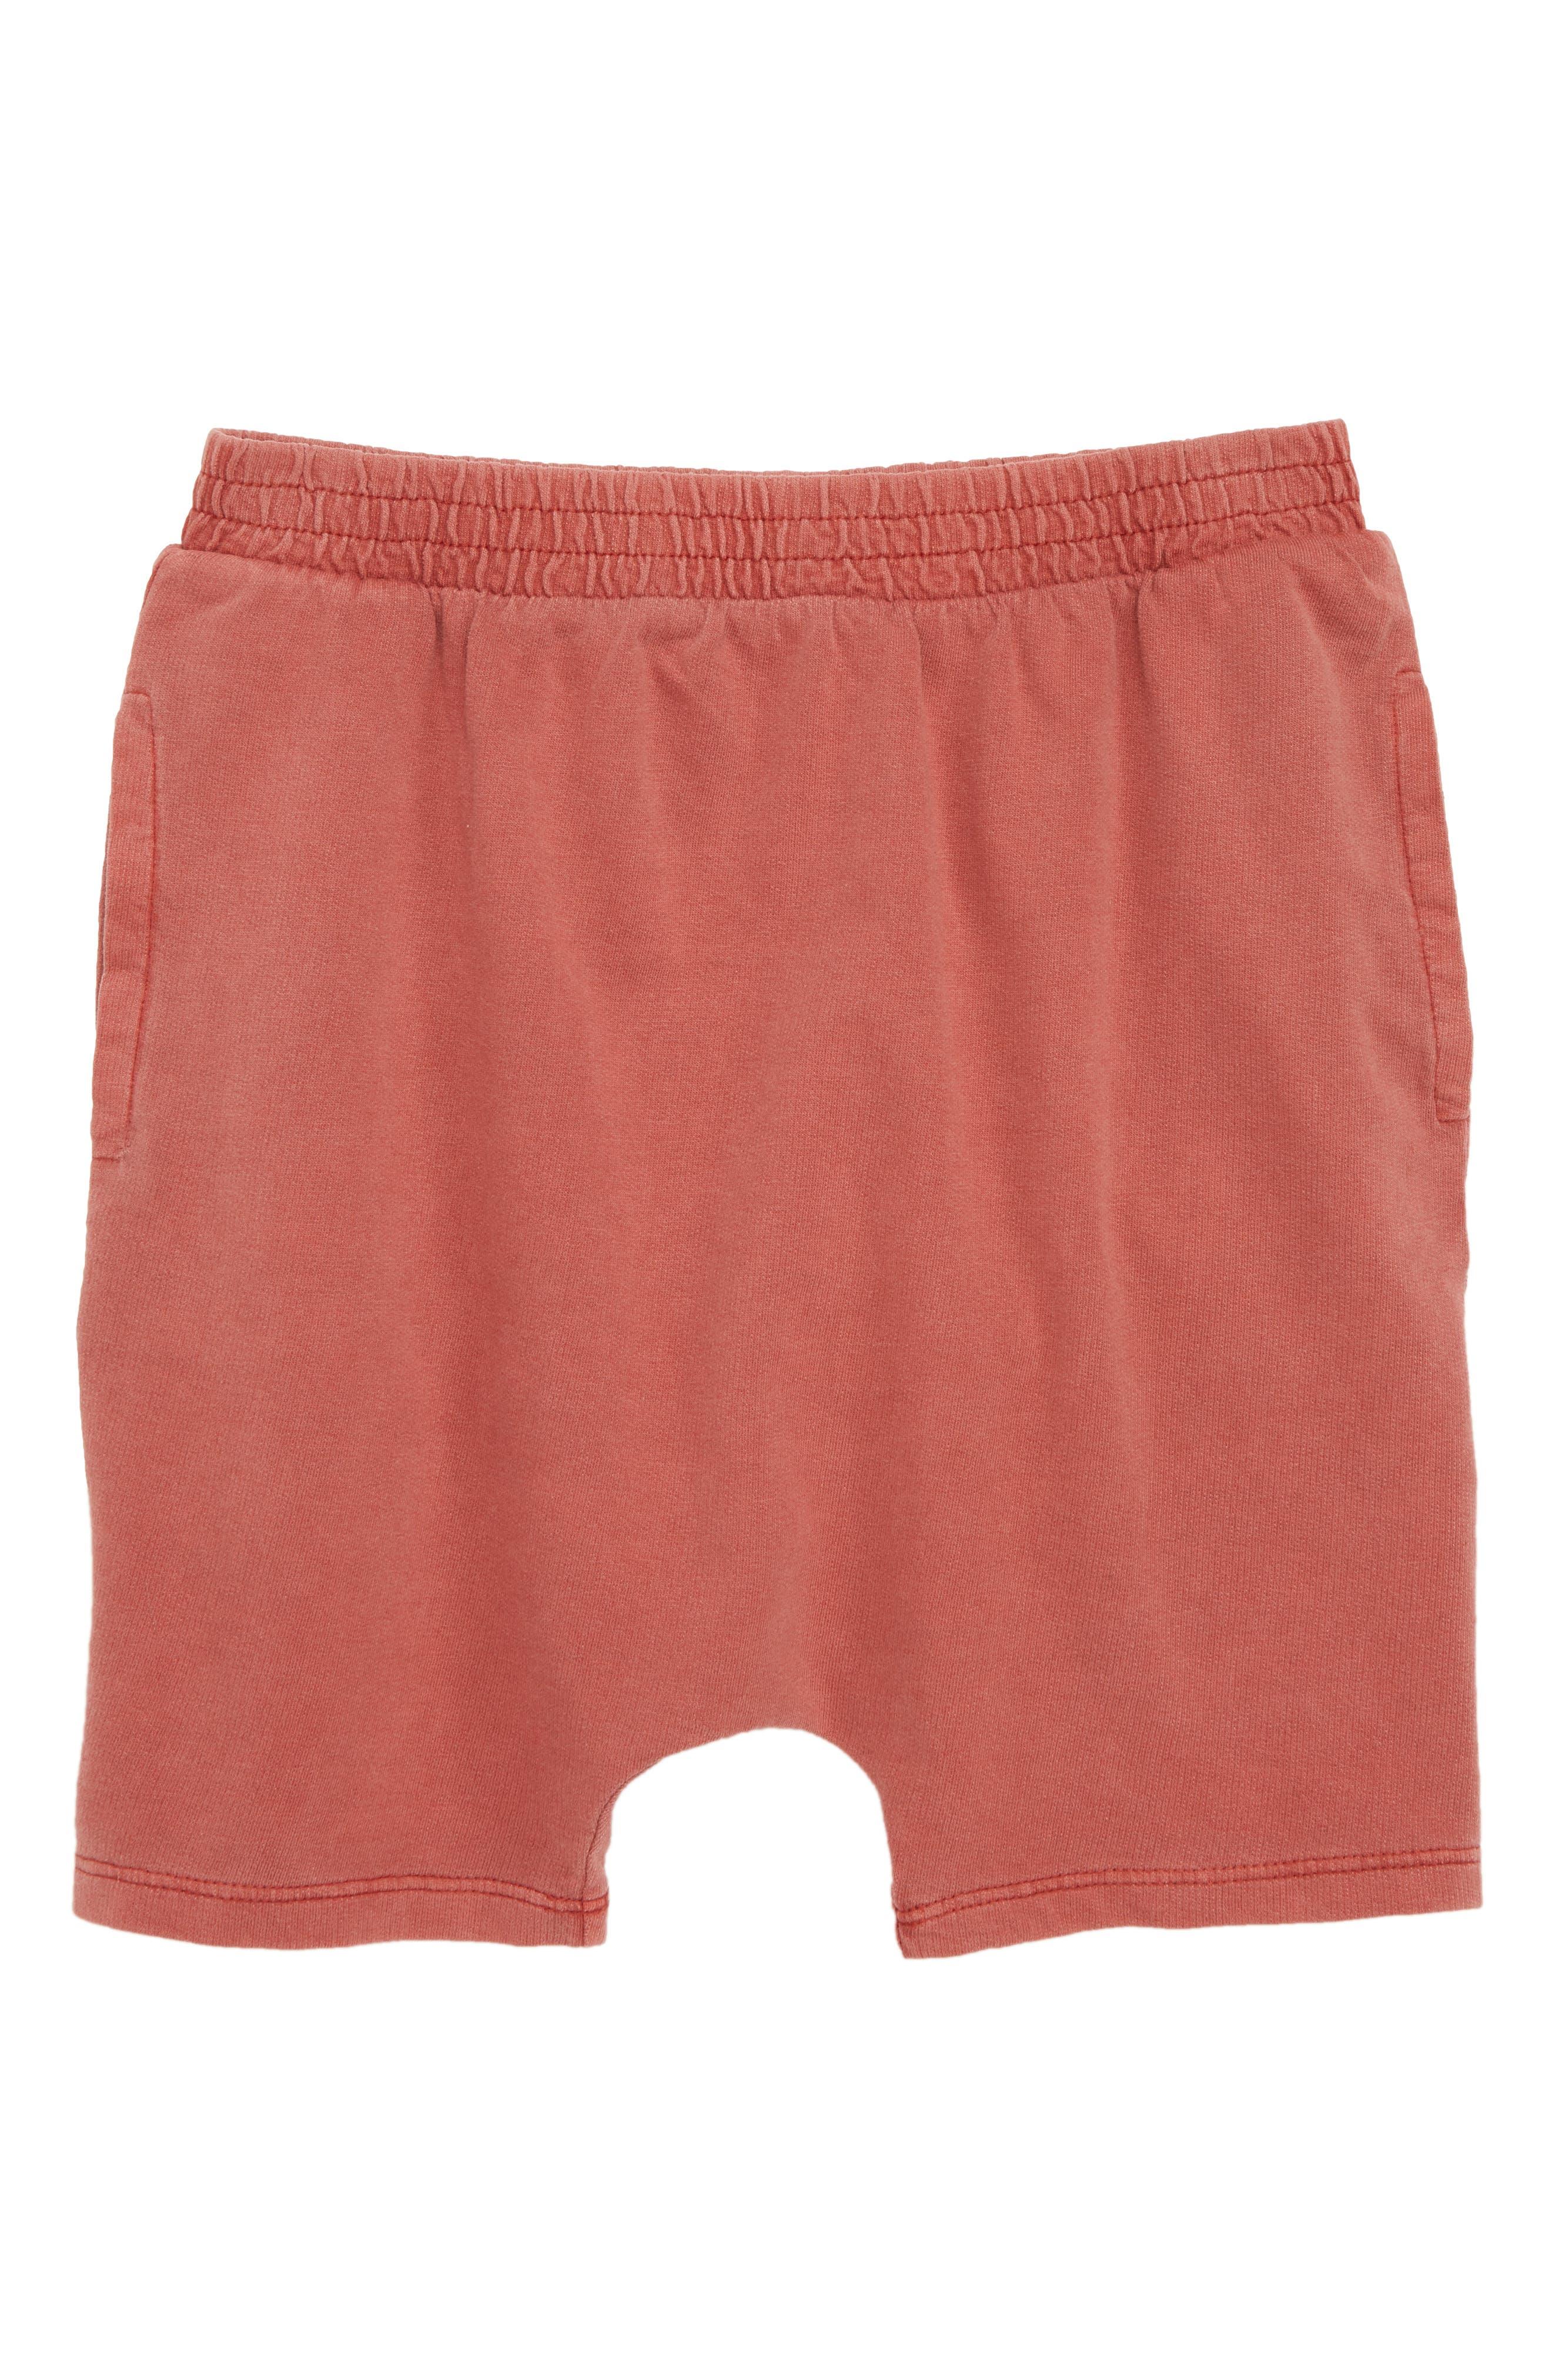 Main Image - Stem Superwash Shorts (Toddler Boys, Little Boys & Big Boys)